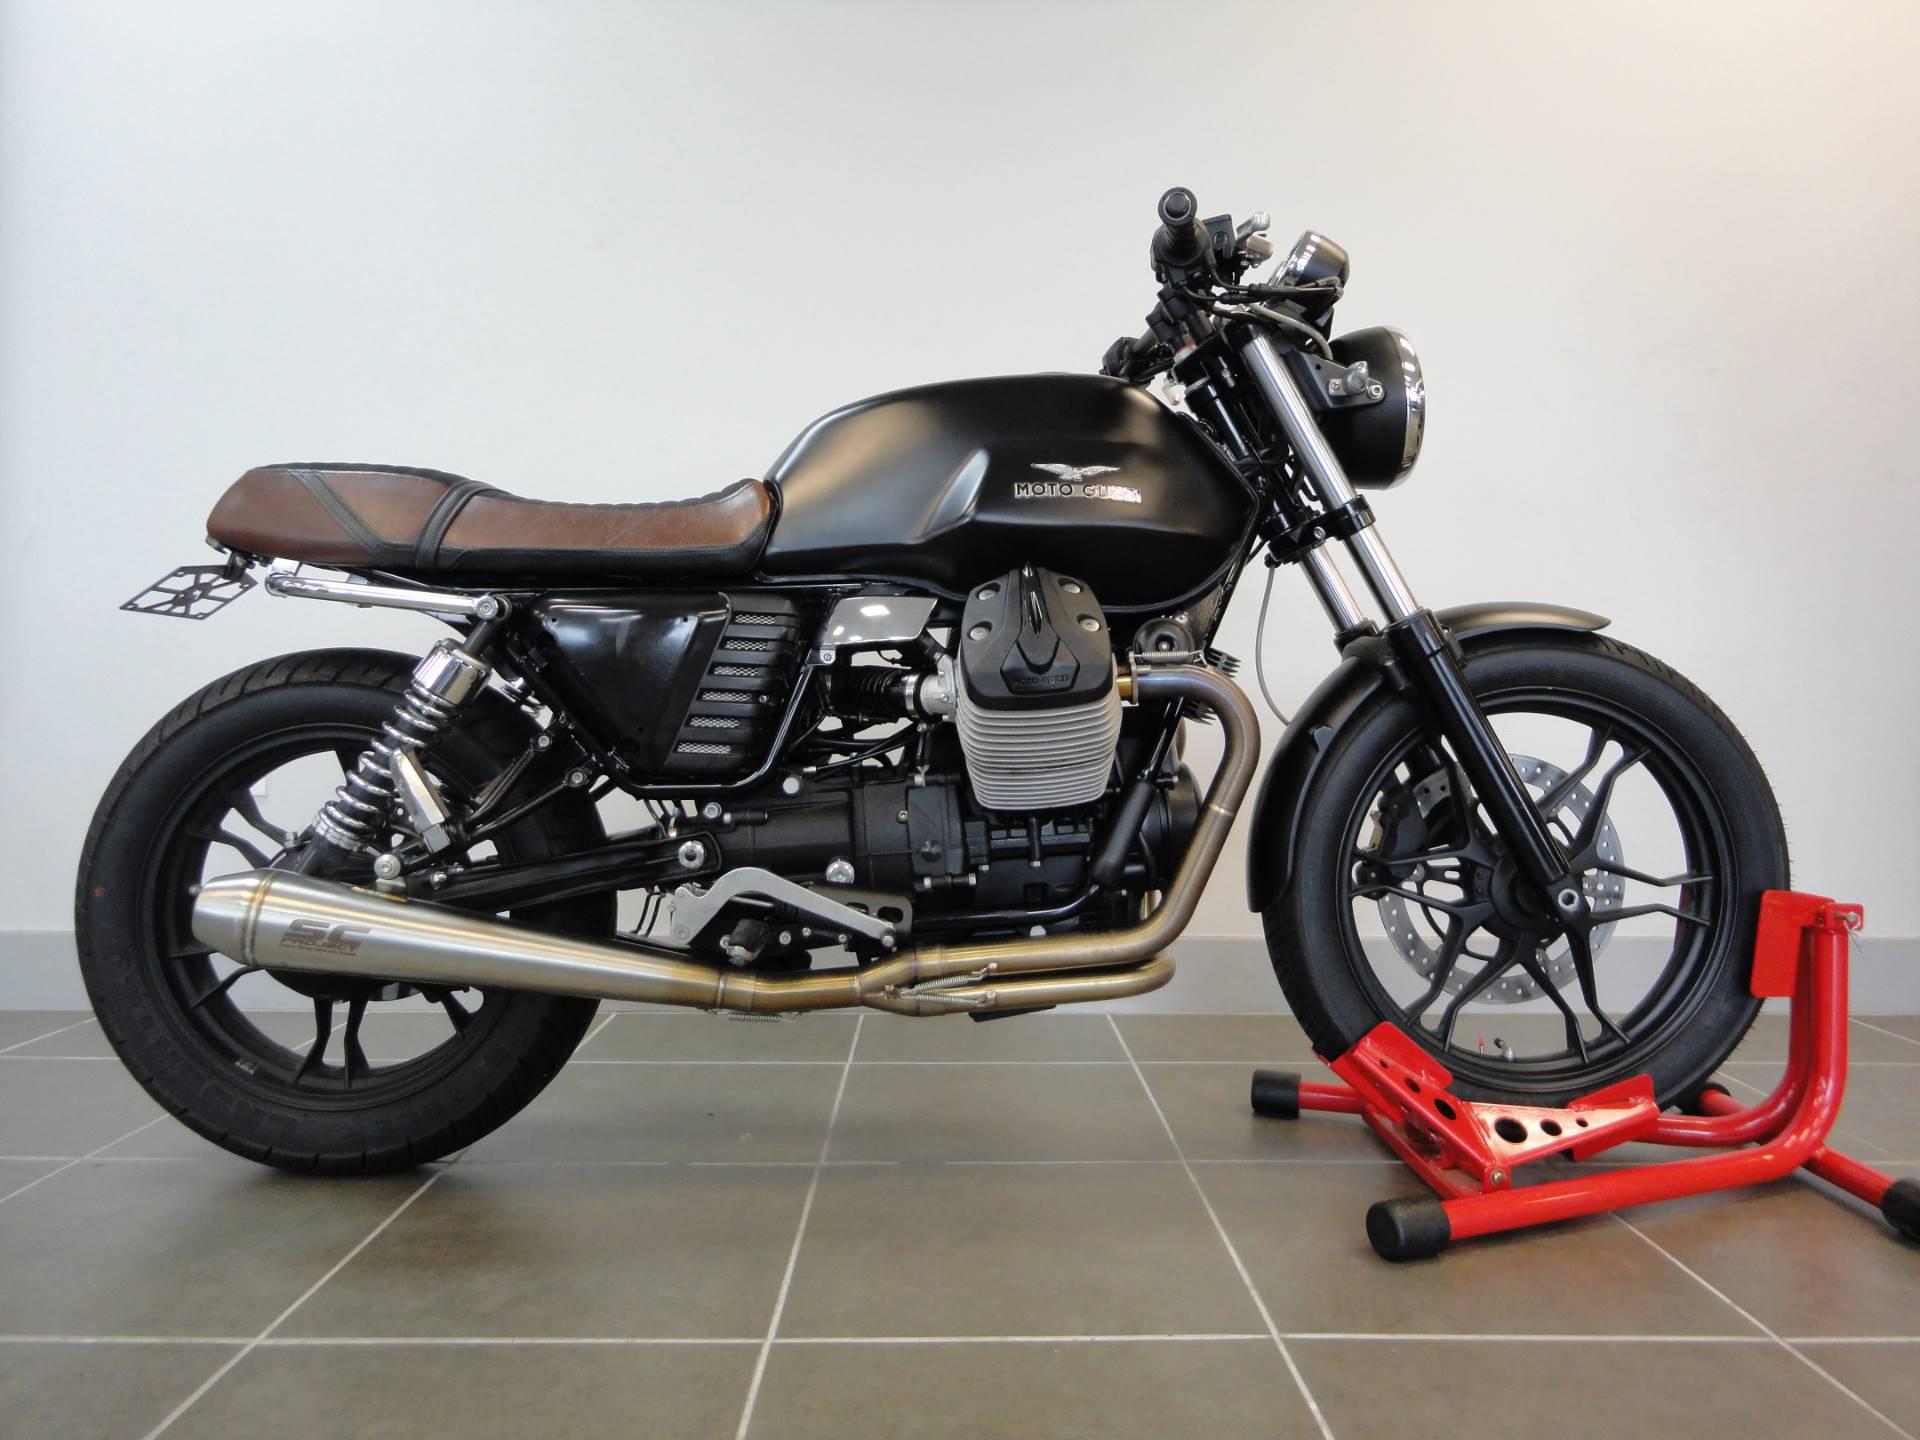 2013 moto guzzi v7 stone for sale. Black Bedroom Furniture Sets. Home Design Ideas